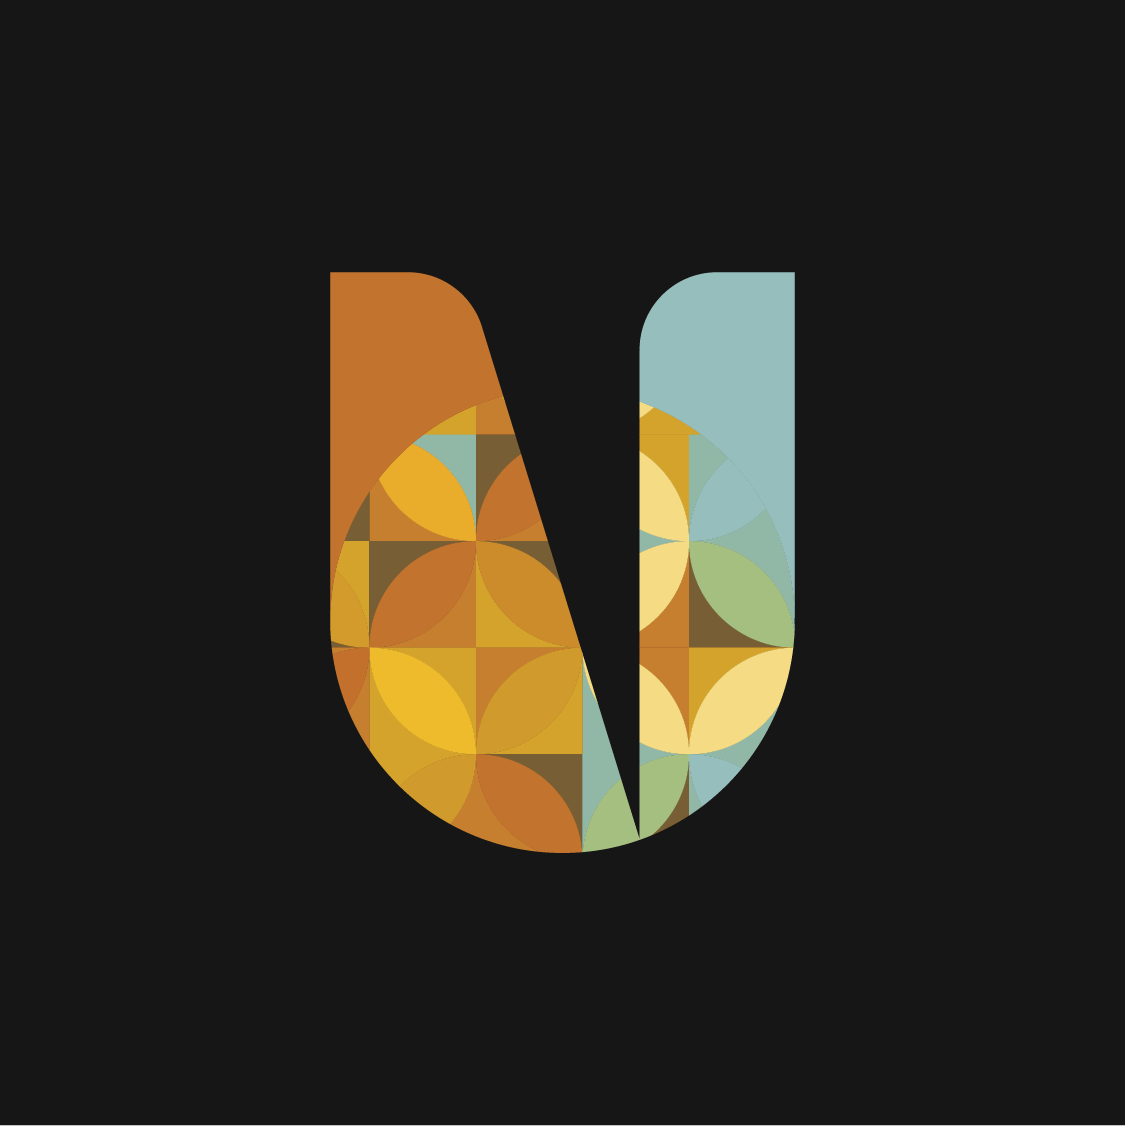 all-logos-2020-99